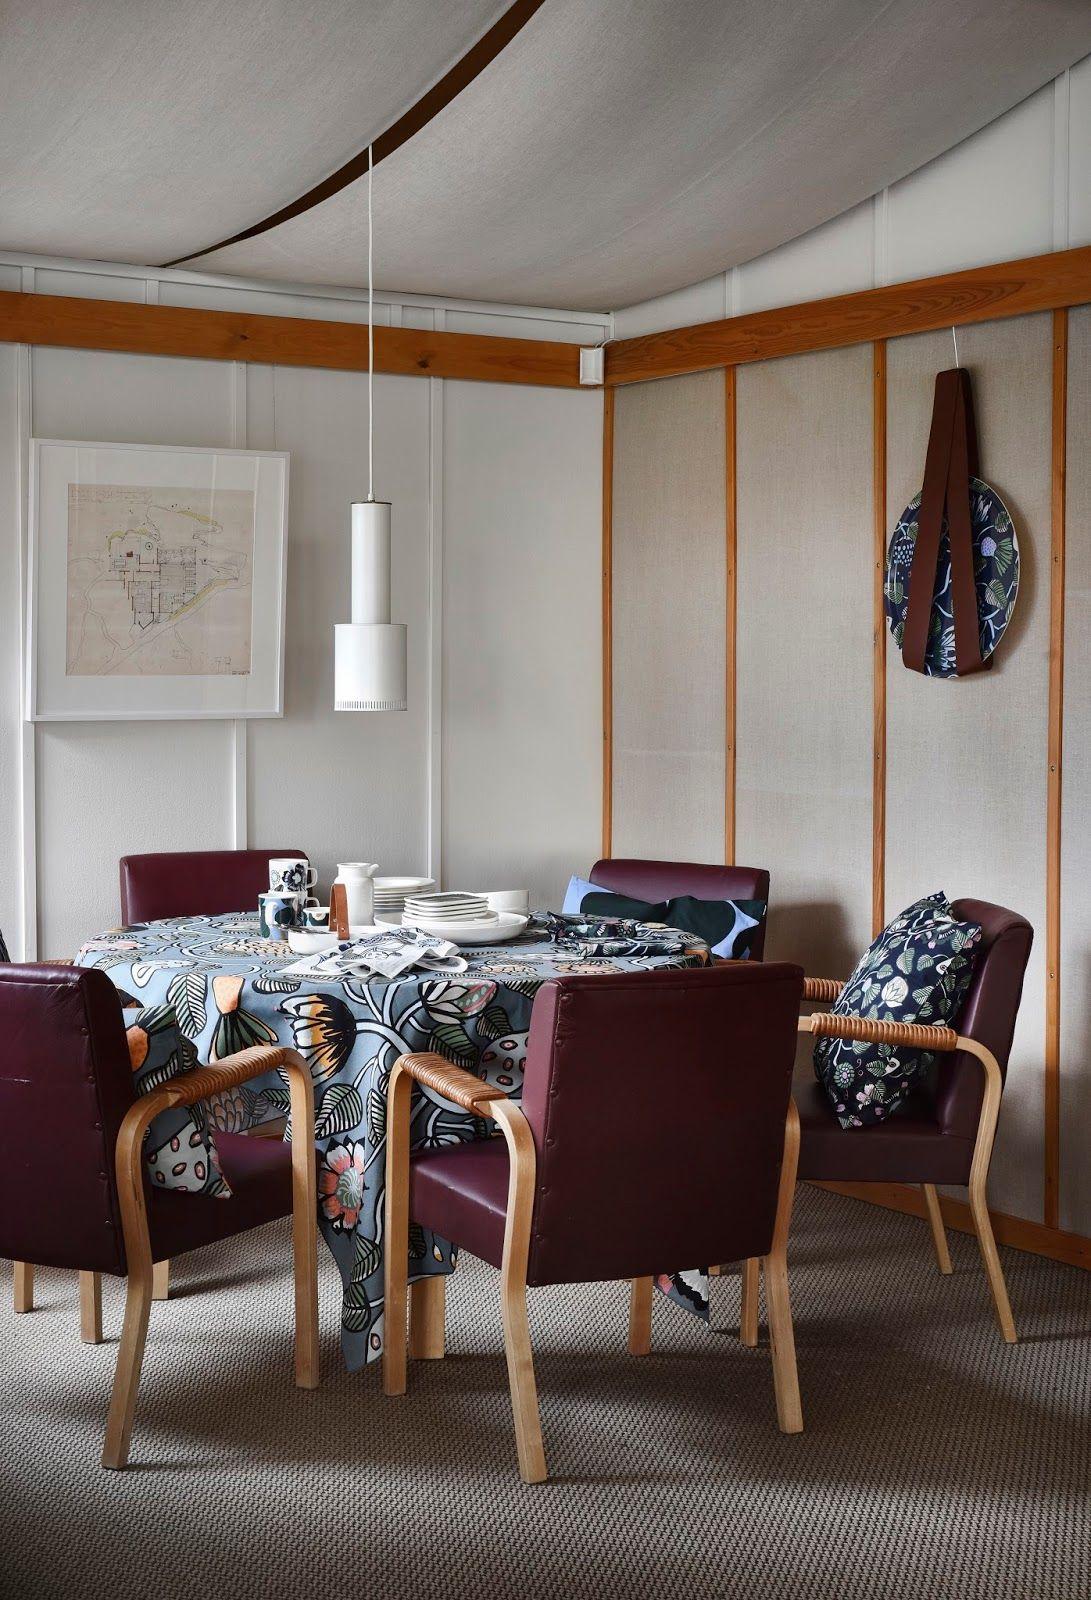 Alvar aalto house interior weekdaycarnival  marimekko home fall winter   architect